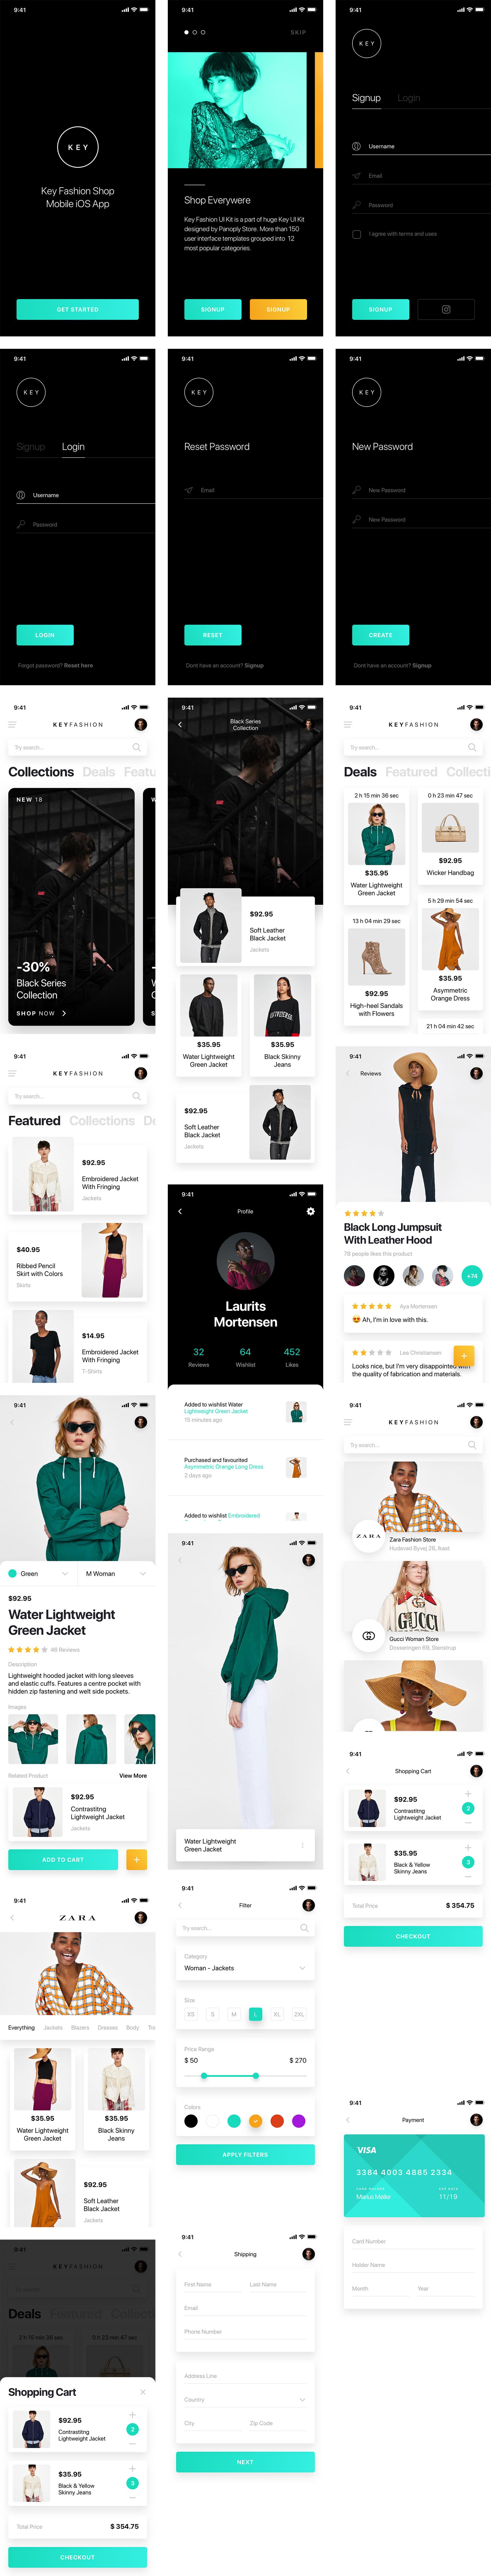 KEY 时尚商店APP界面设计.sketch素材下载 界面-第1张